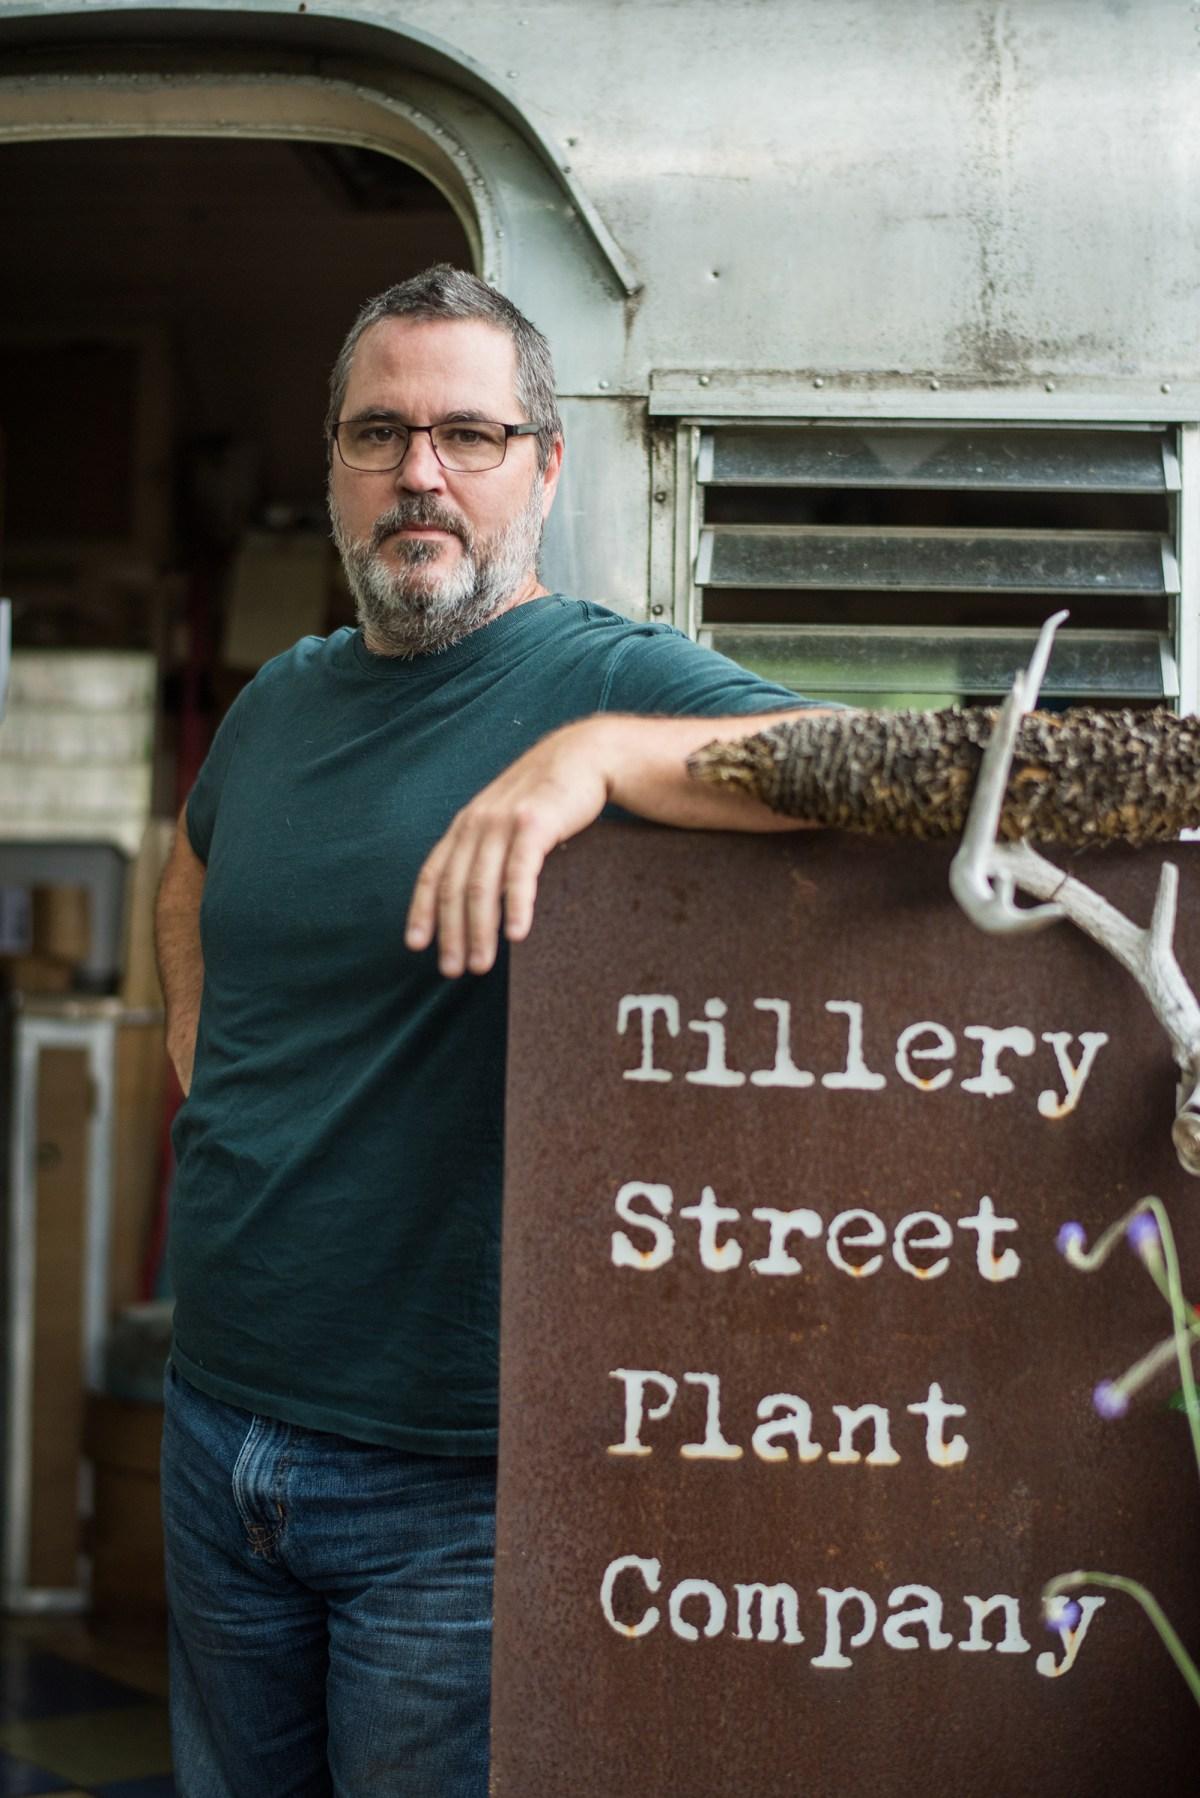 Jon Hutson Tillery Street Plant Company nursery gardening horticulture